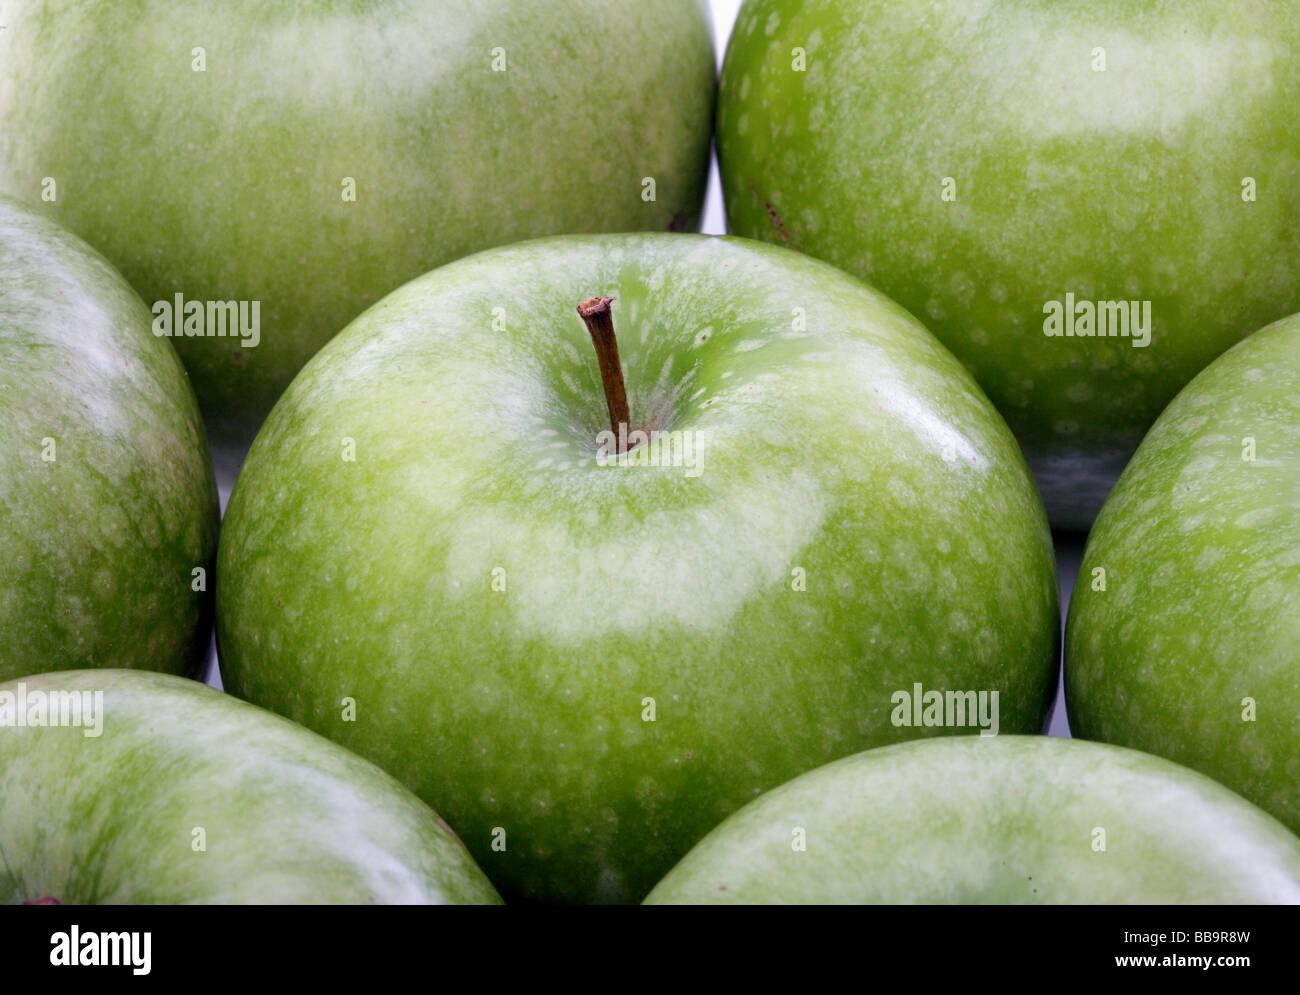 Pomme verte Photo Stock